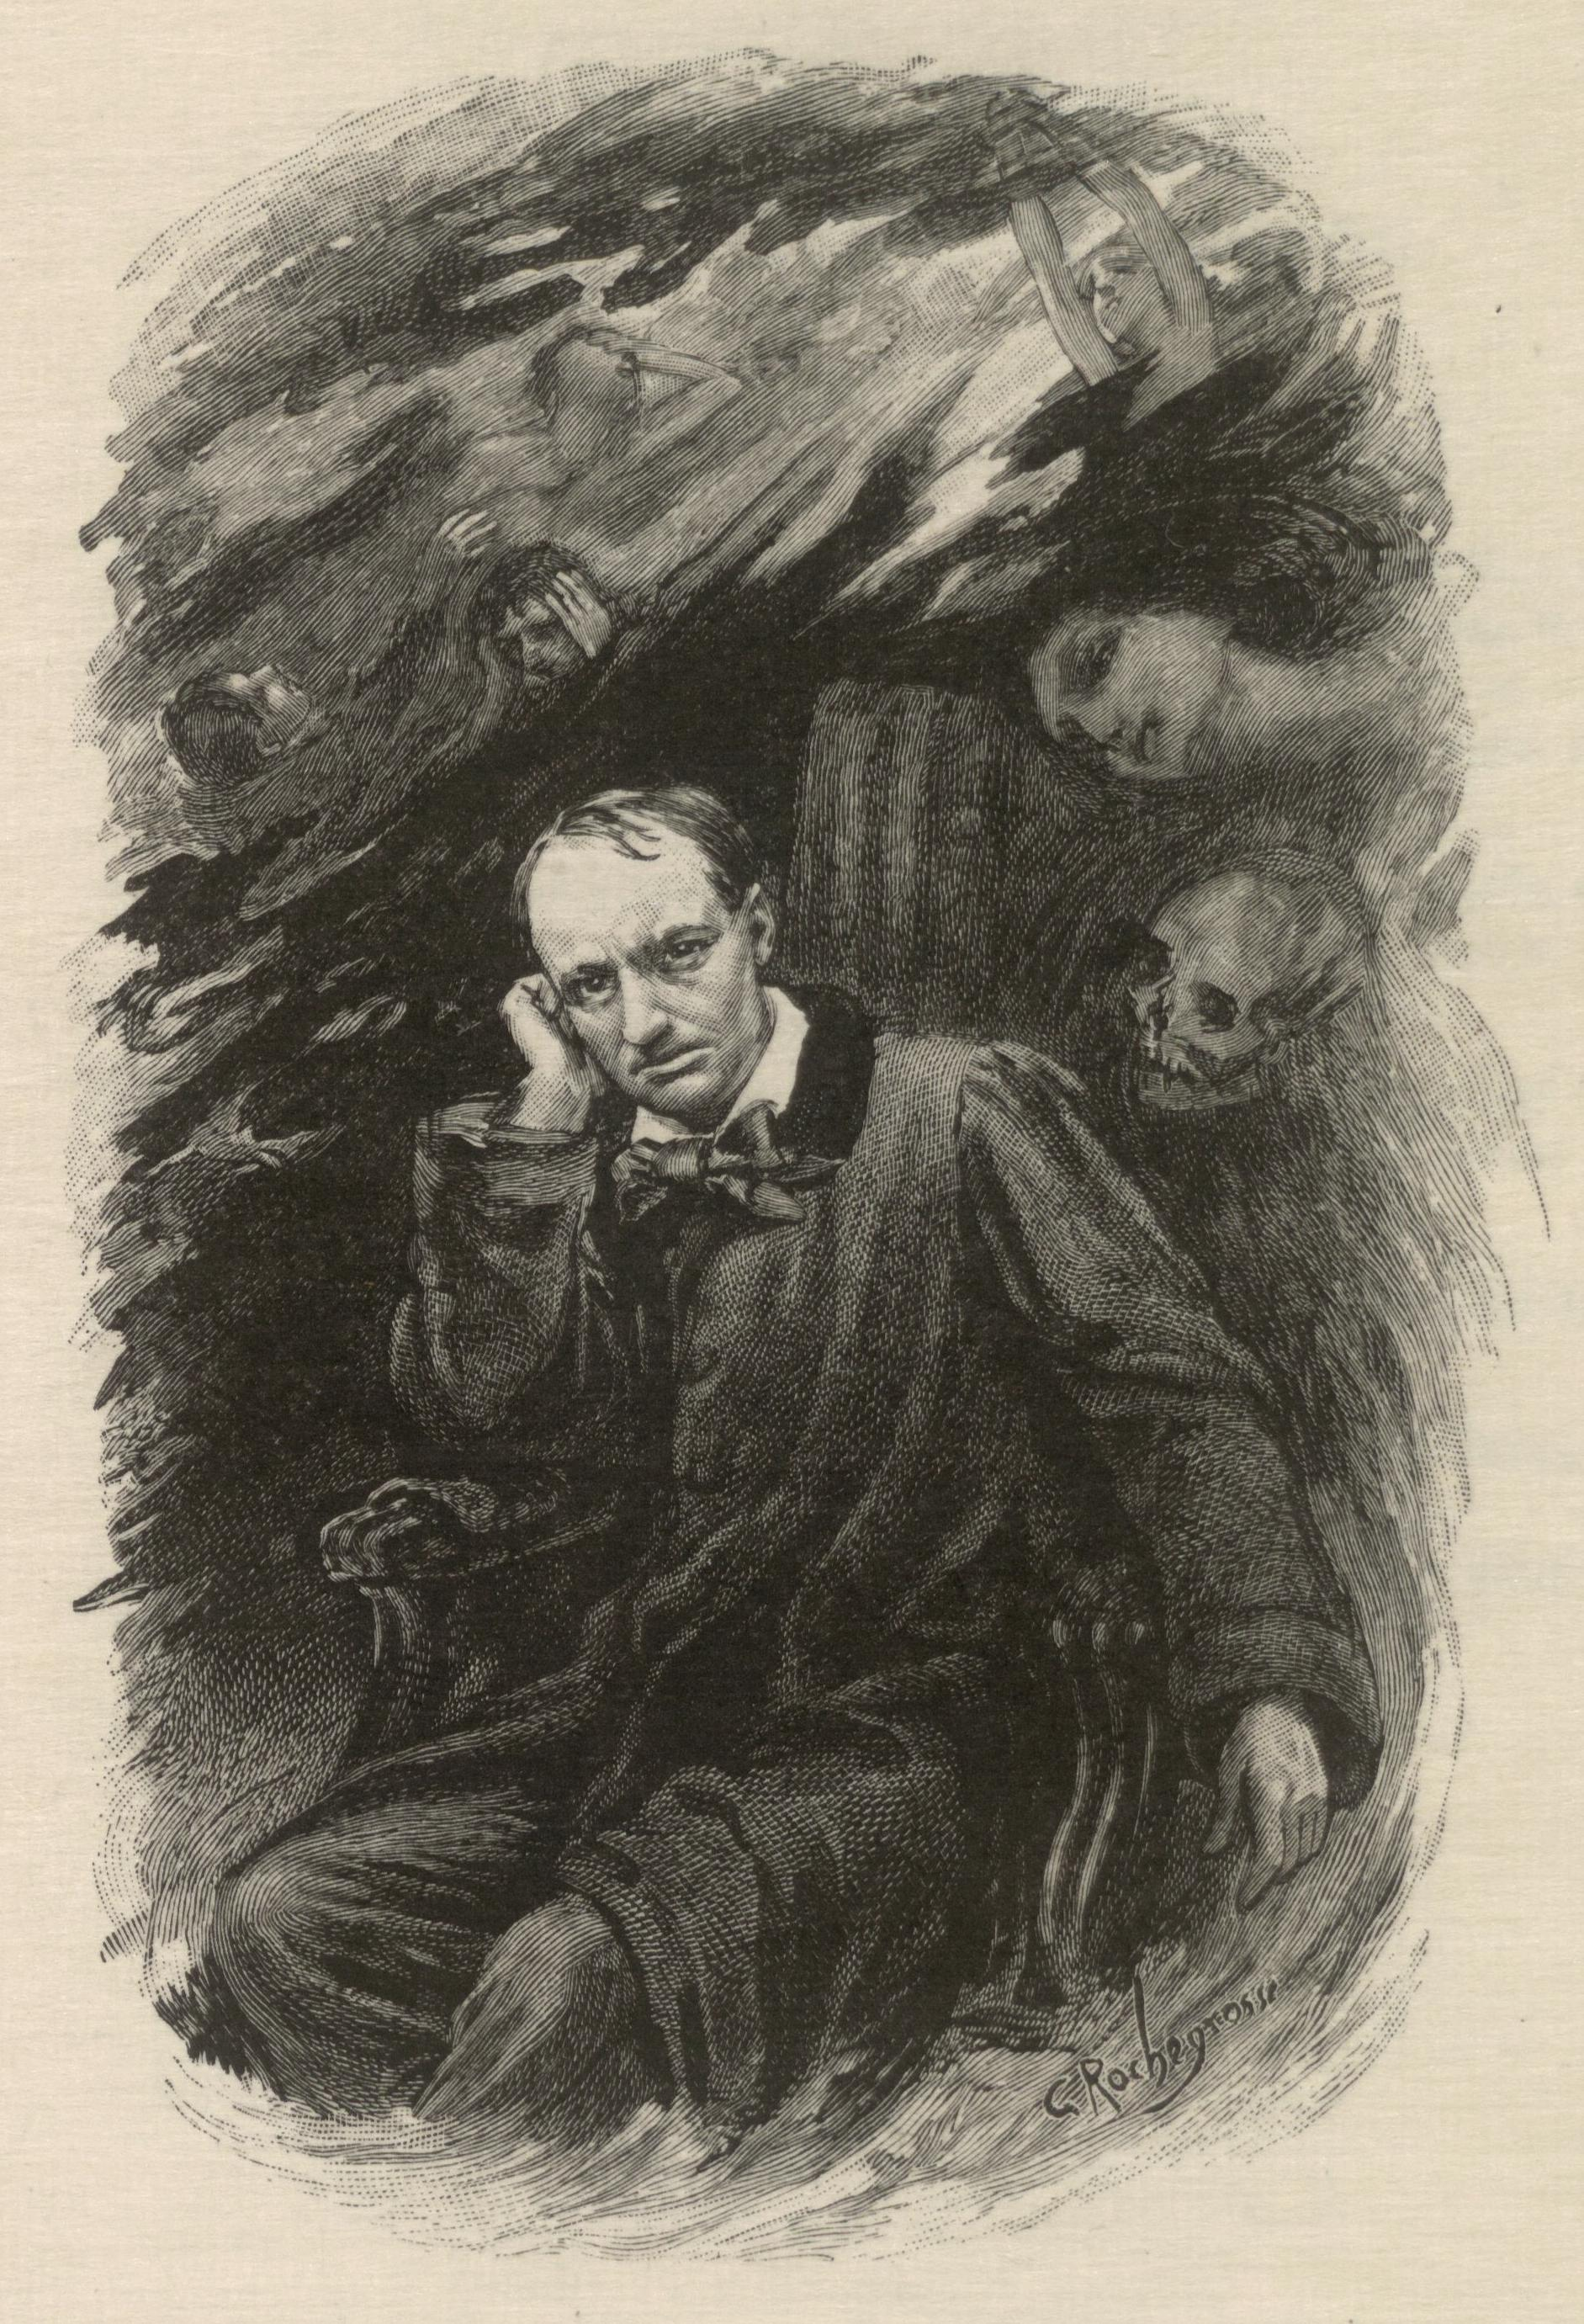 fantôme traduction espagnol